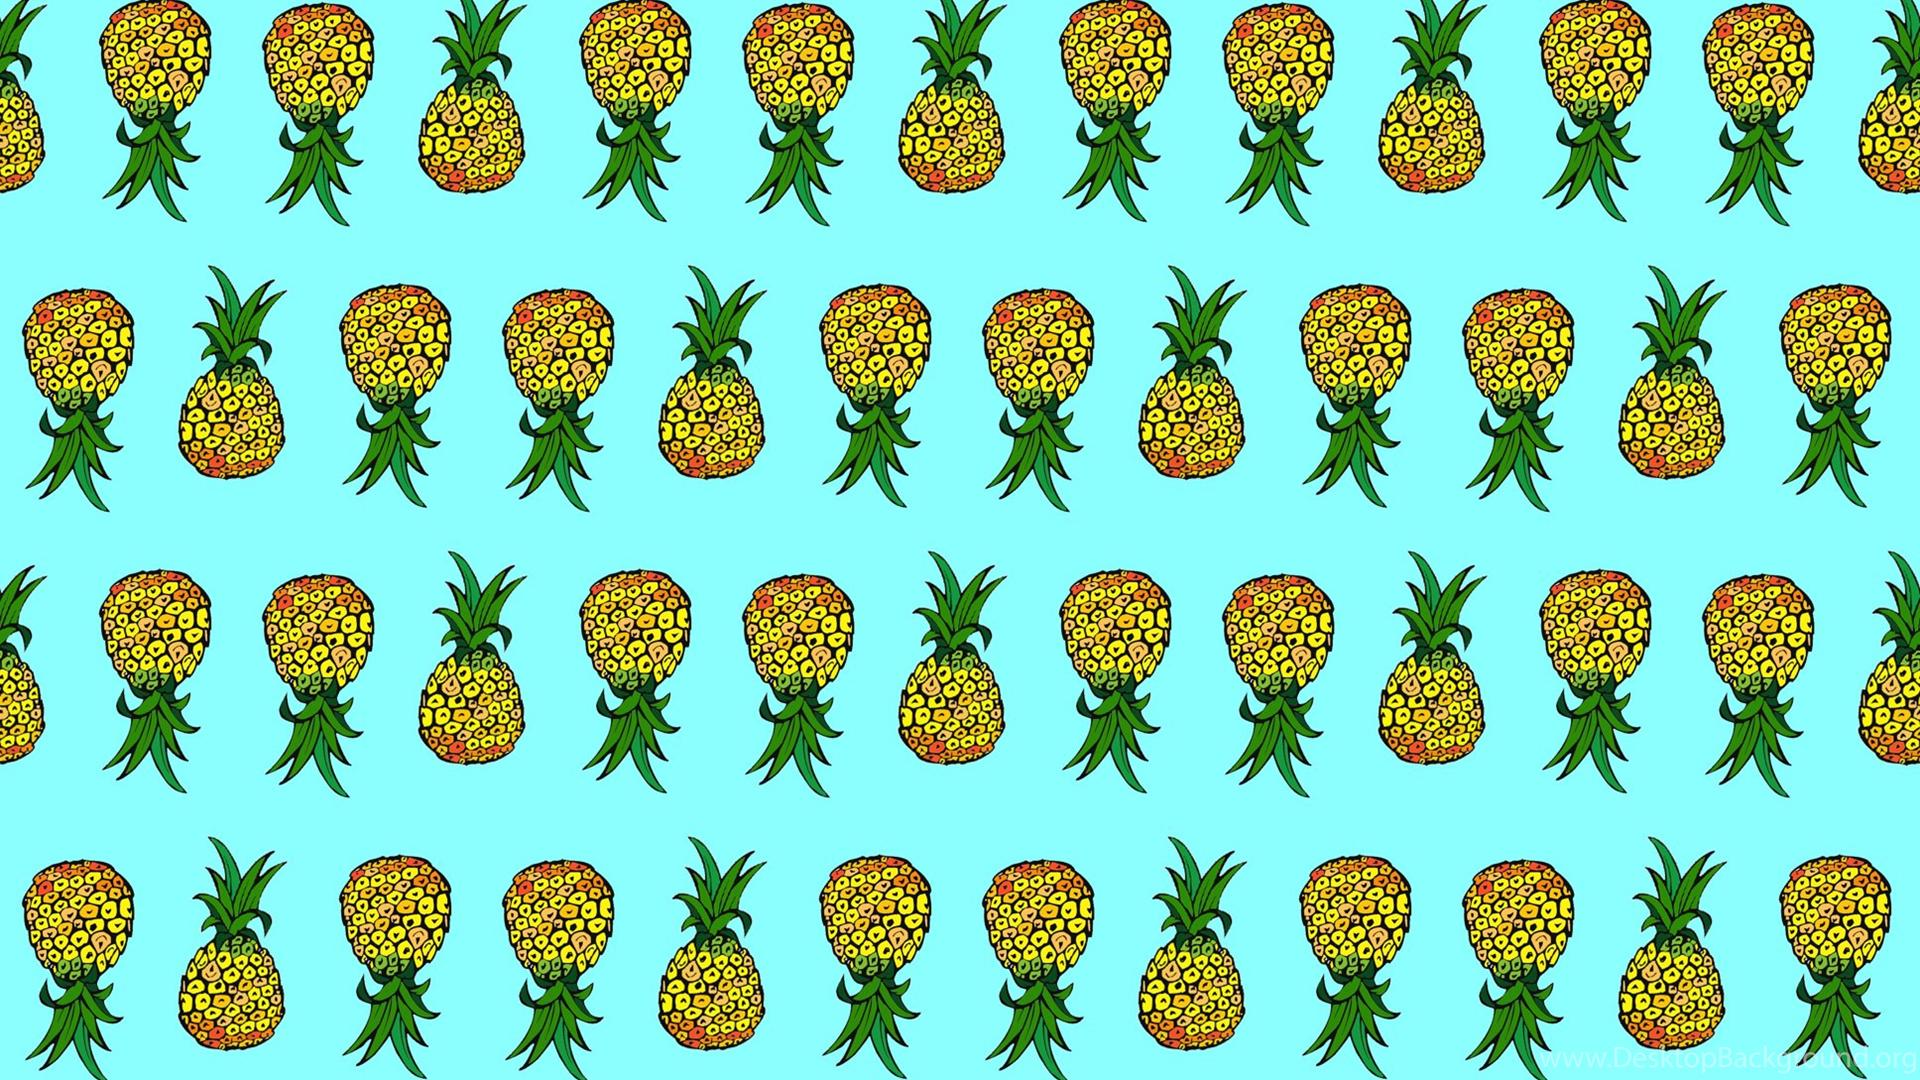 Pineapple HD Wallpapers Desktop Background